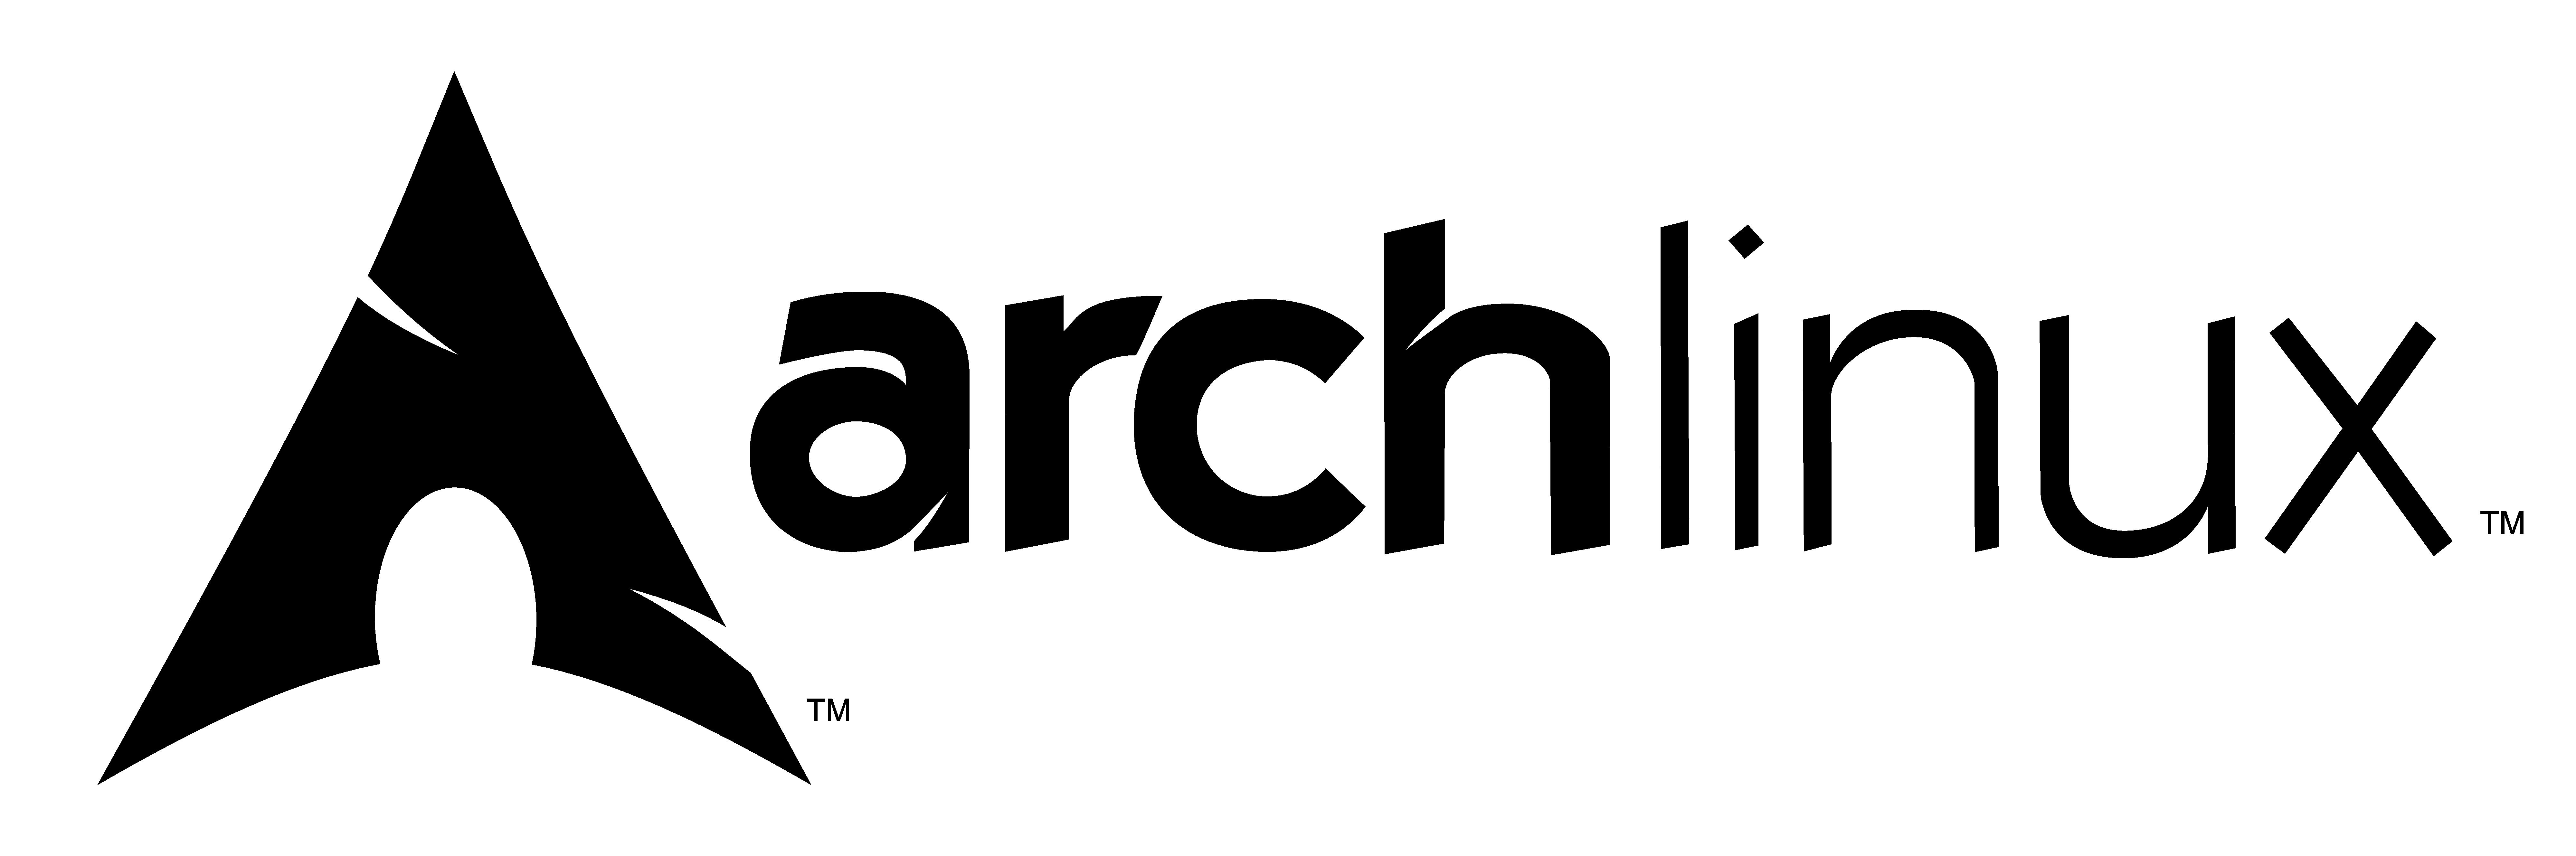 public/static/logos/.